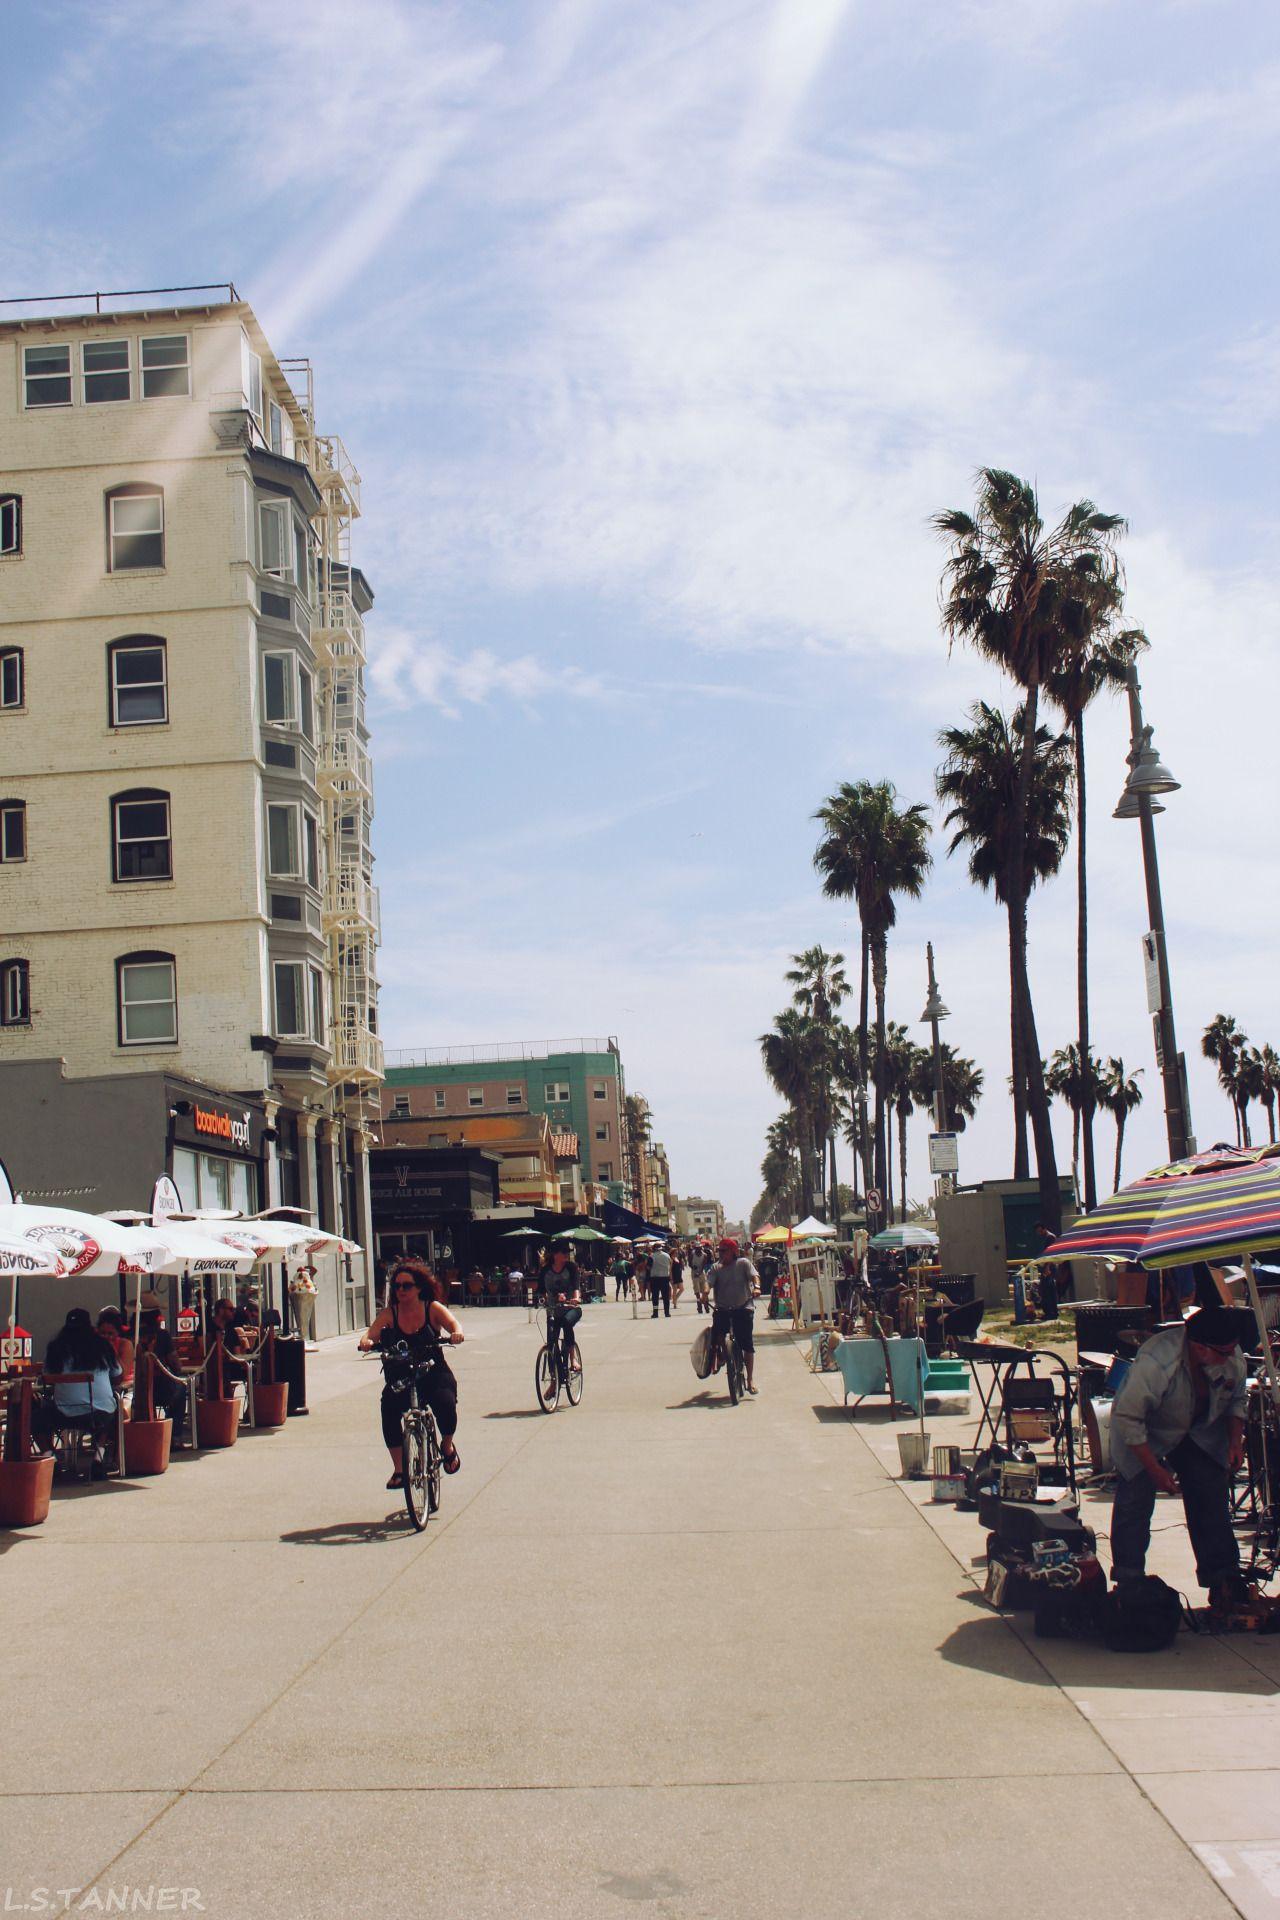 california venice   Tumblr